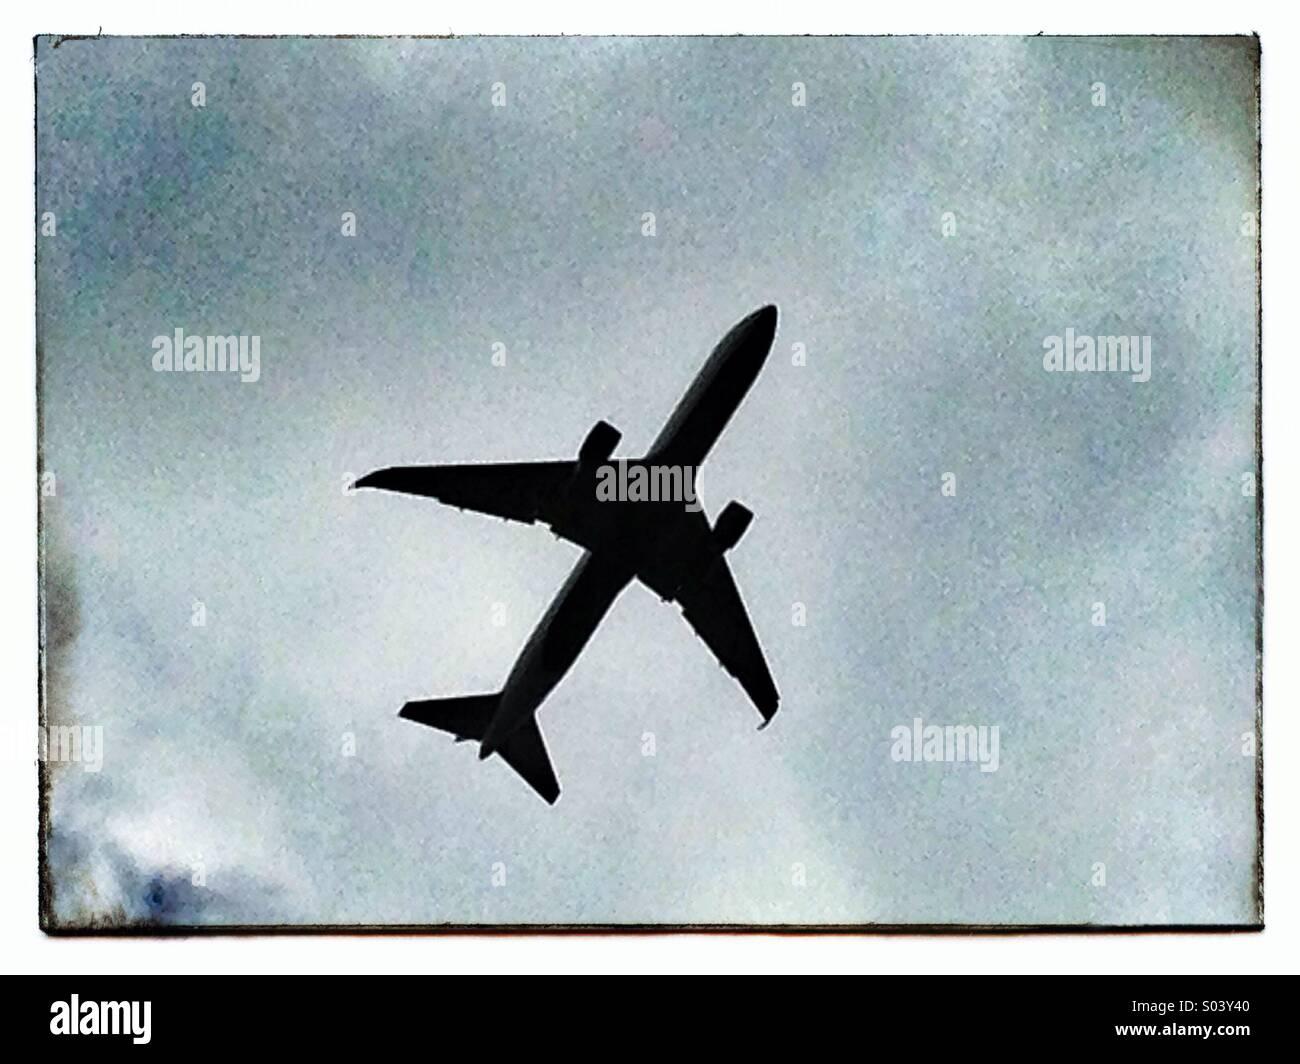 Commercial jetliner in-flight - Stock Image